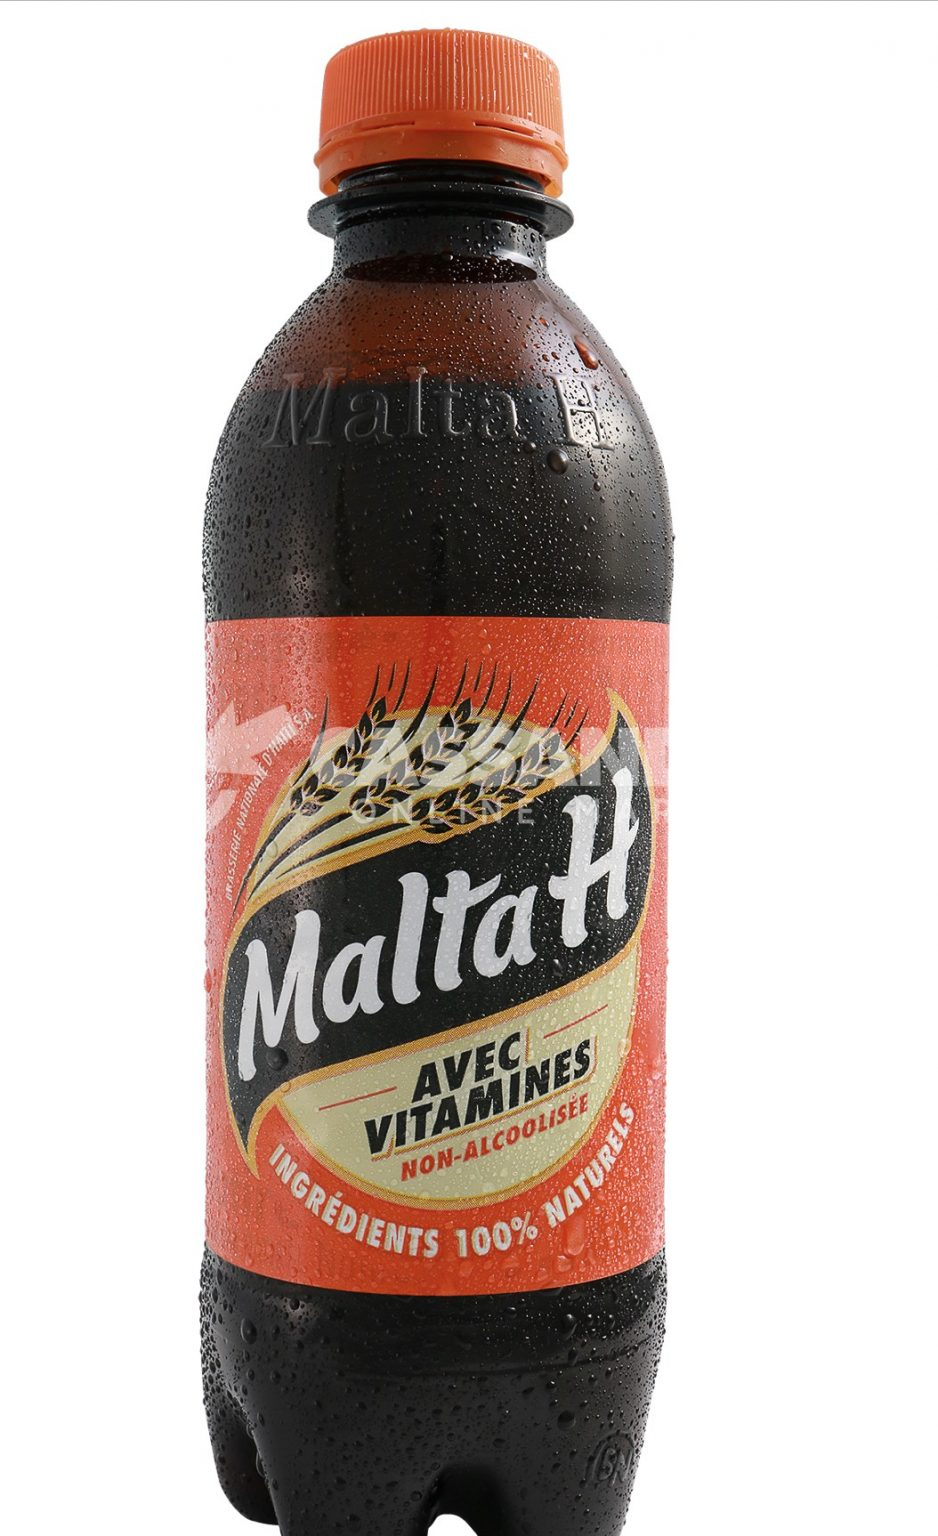 Malta H pack of 12 x 12 Oz